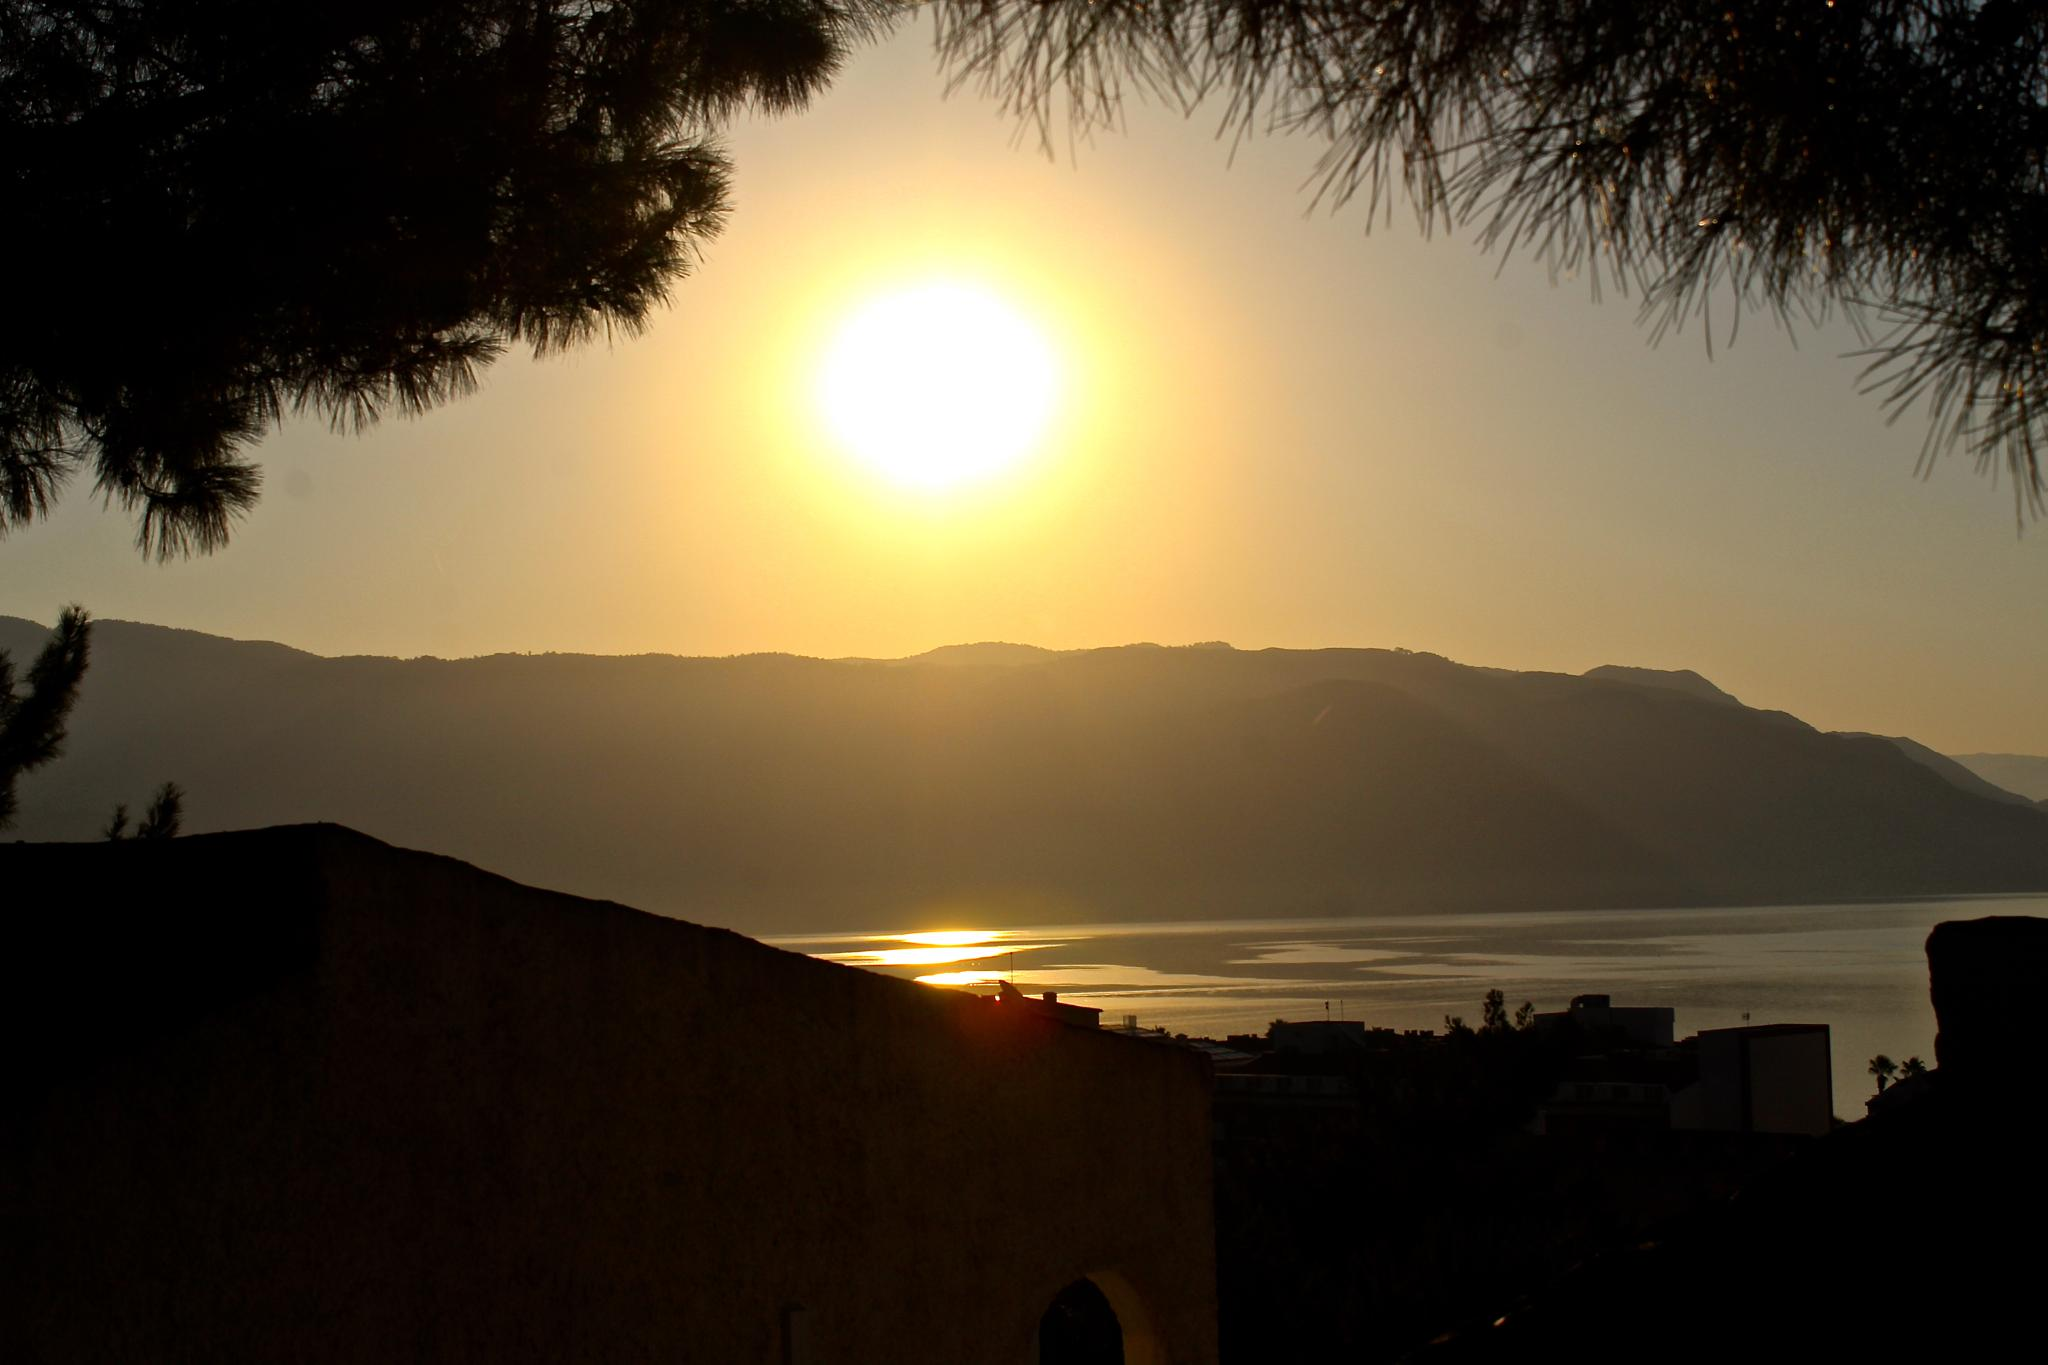 Sun going down in Marmaris - City by John Weijts